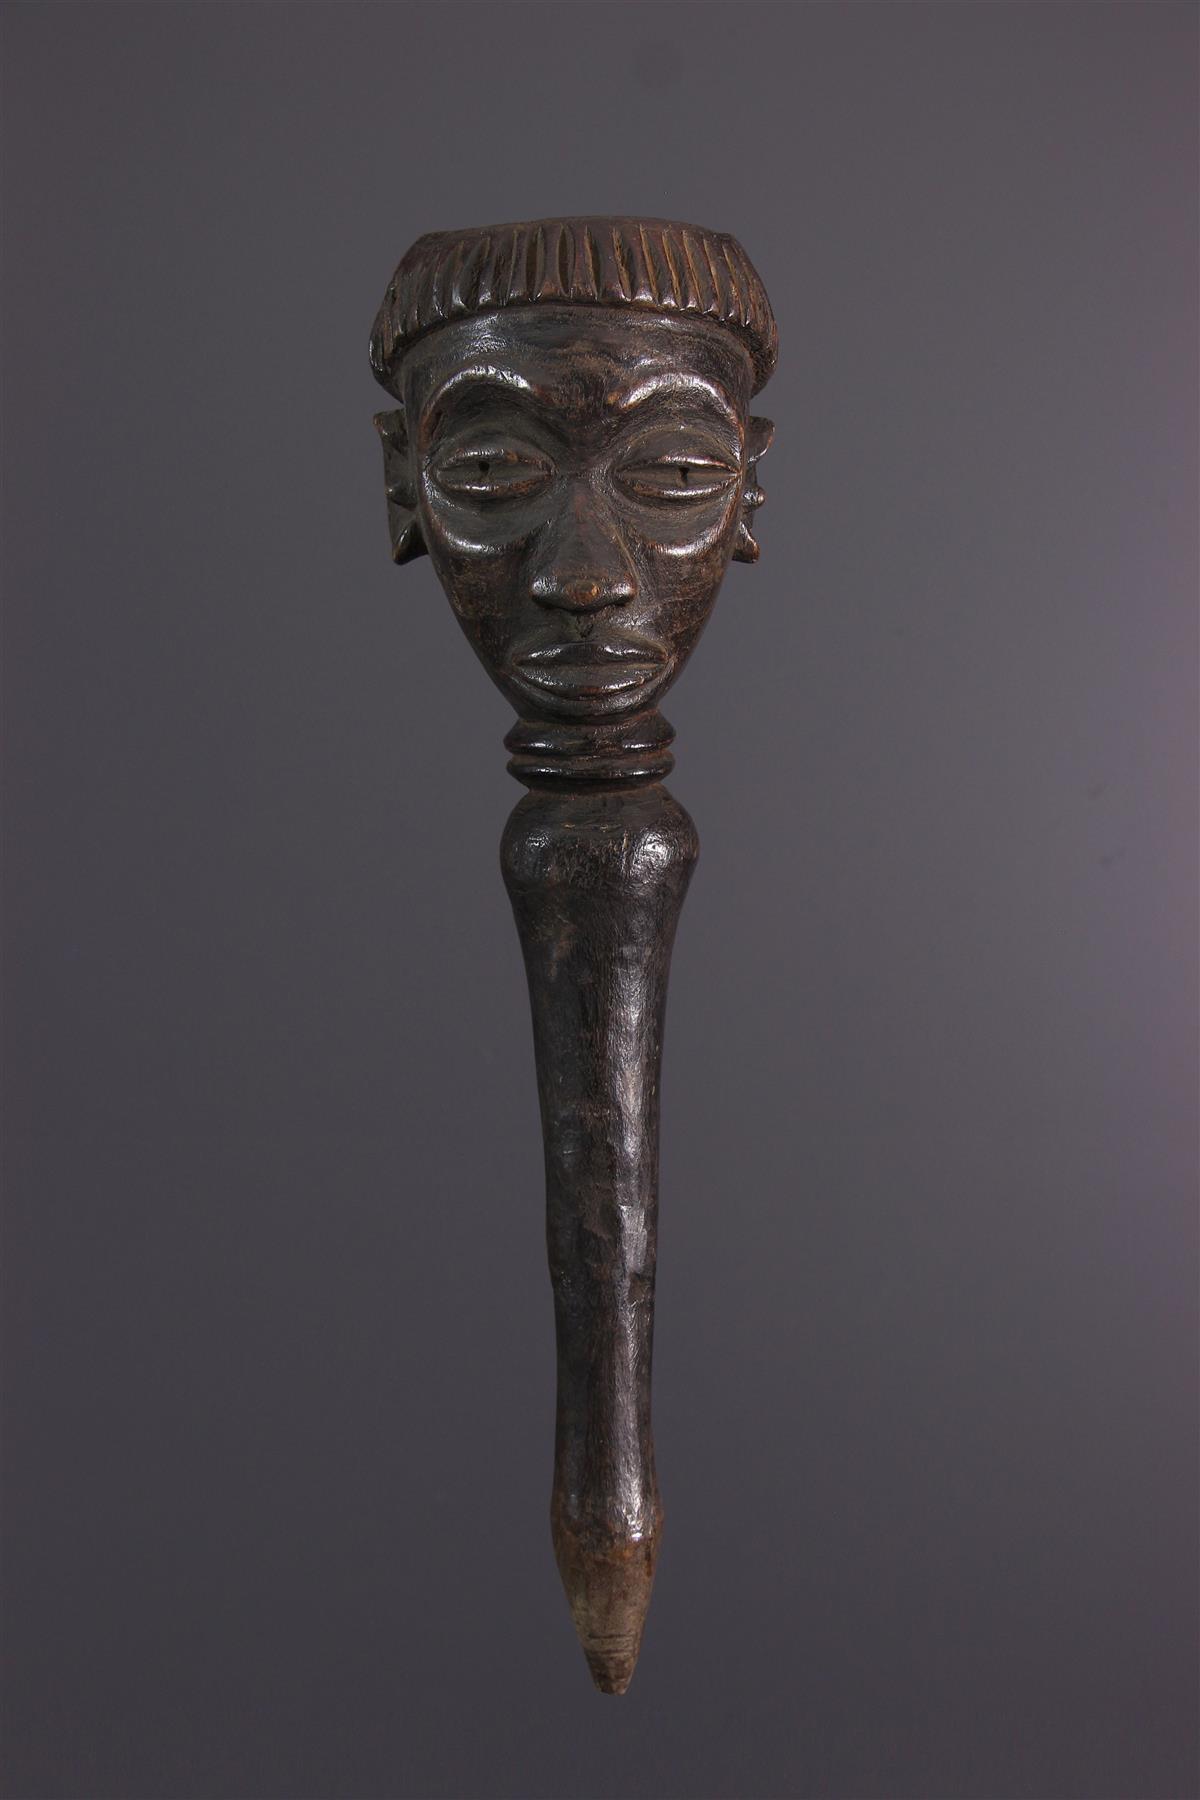 Pende cup - Tribal art